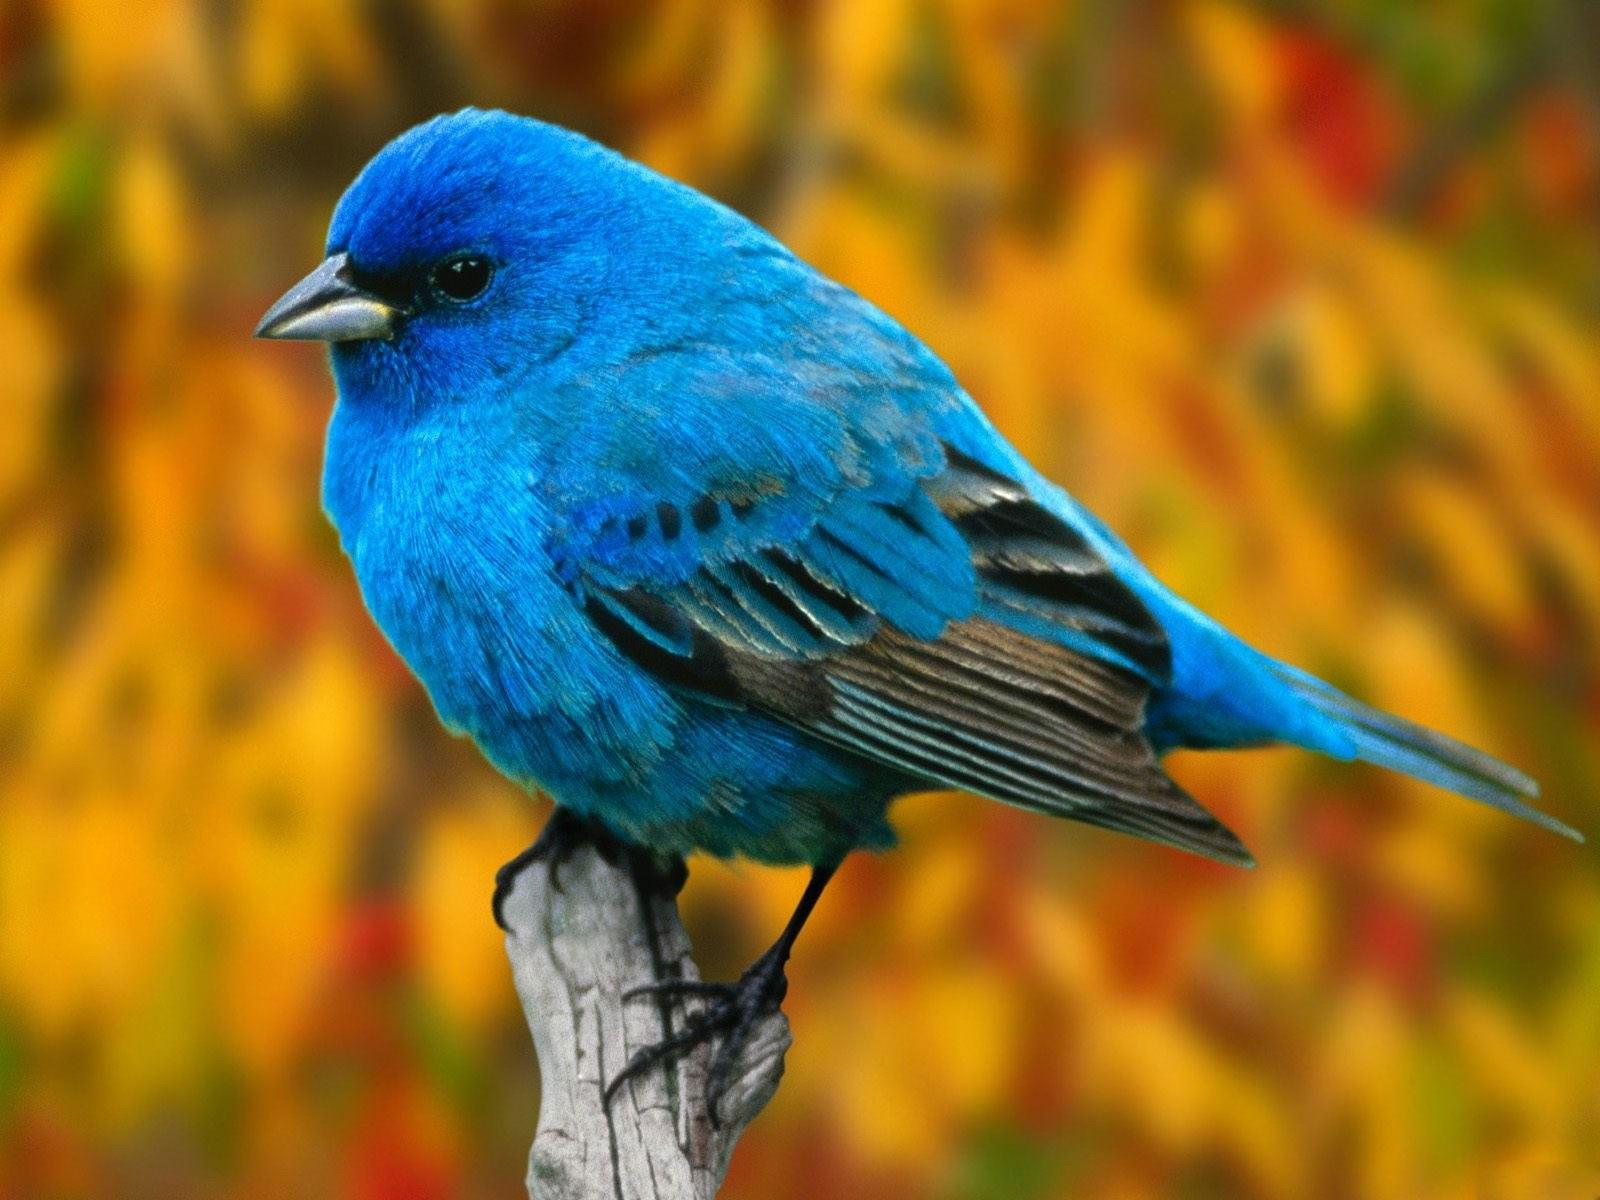 HD WALLPAPERS Colorful Birds Desktop wallpapers 1600x1200